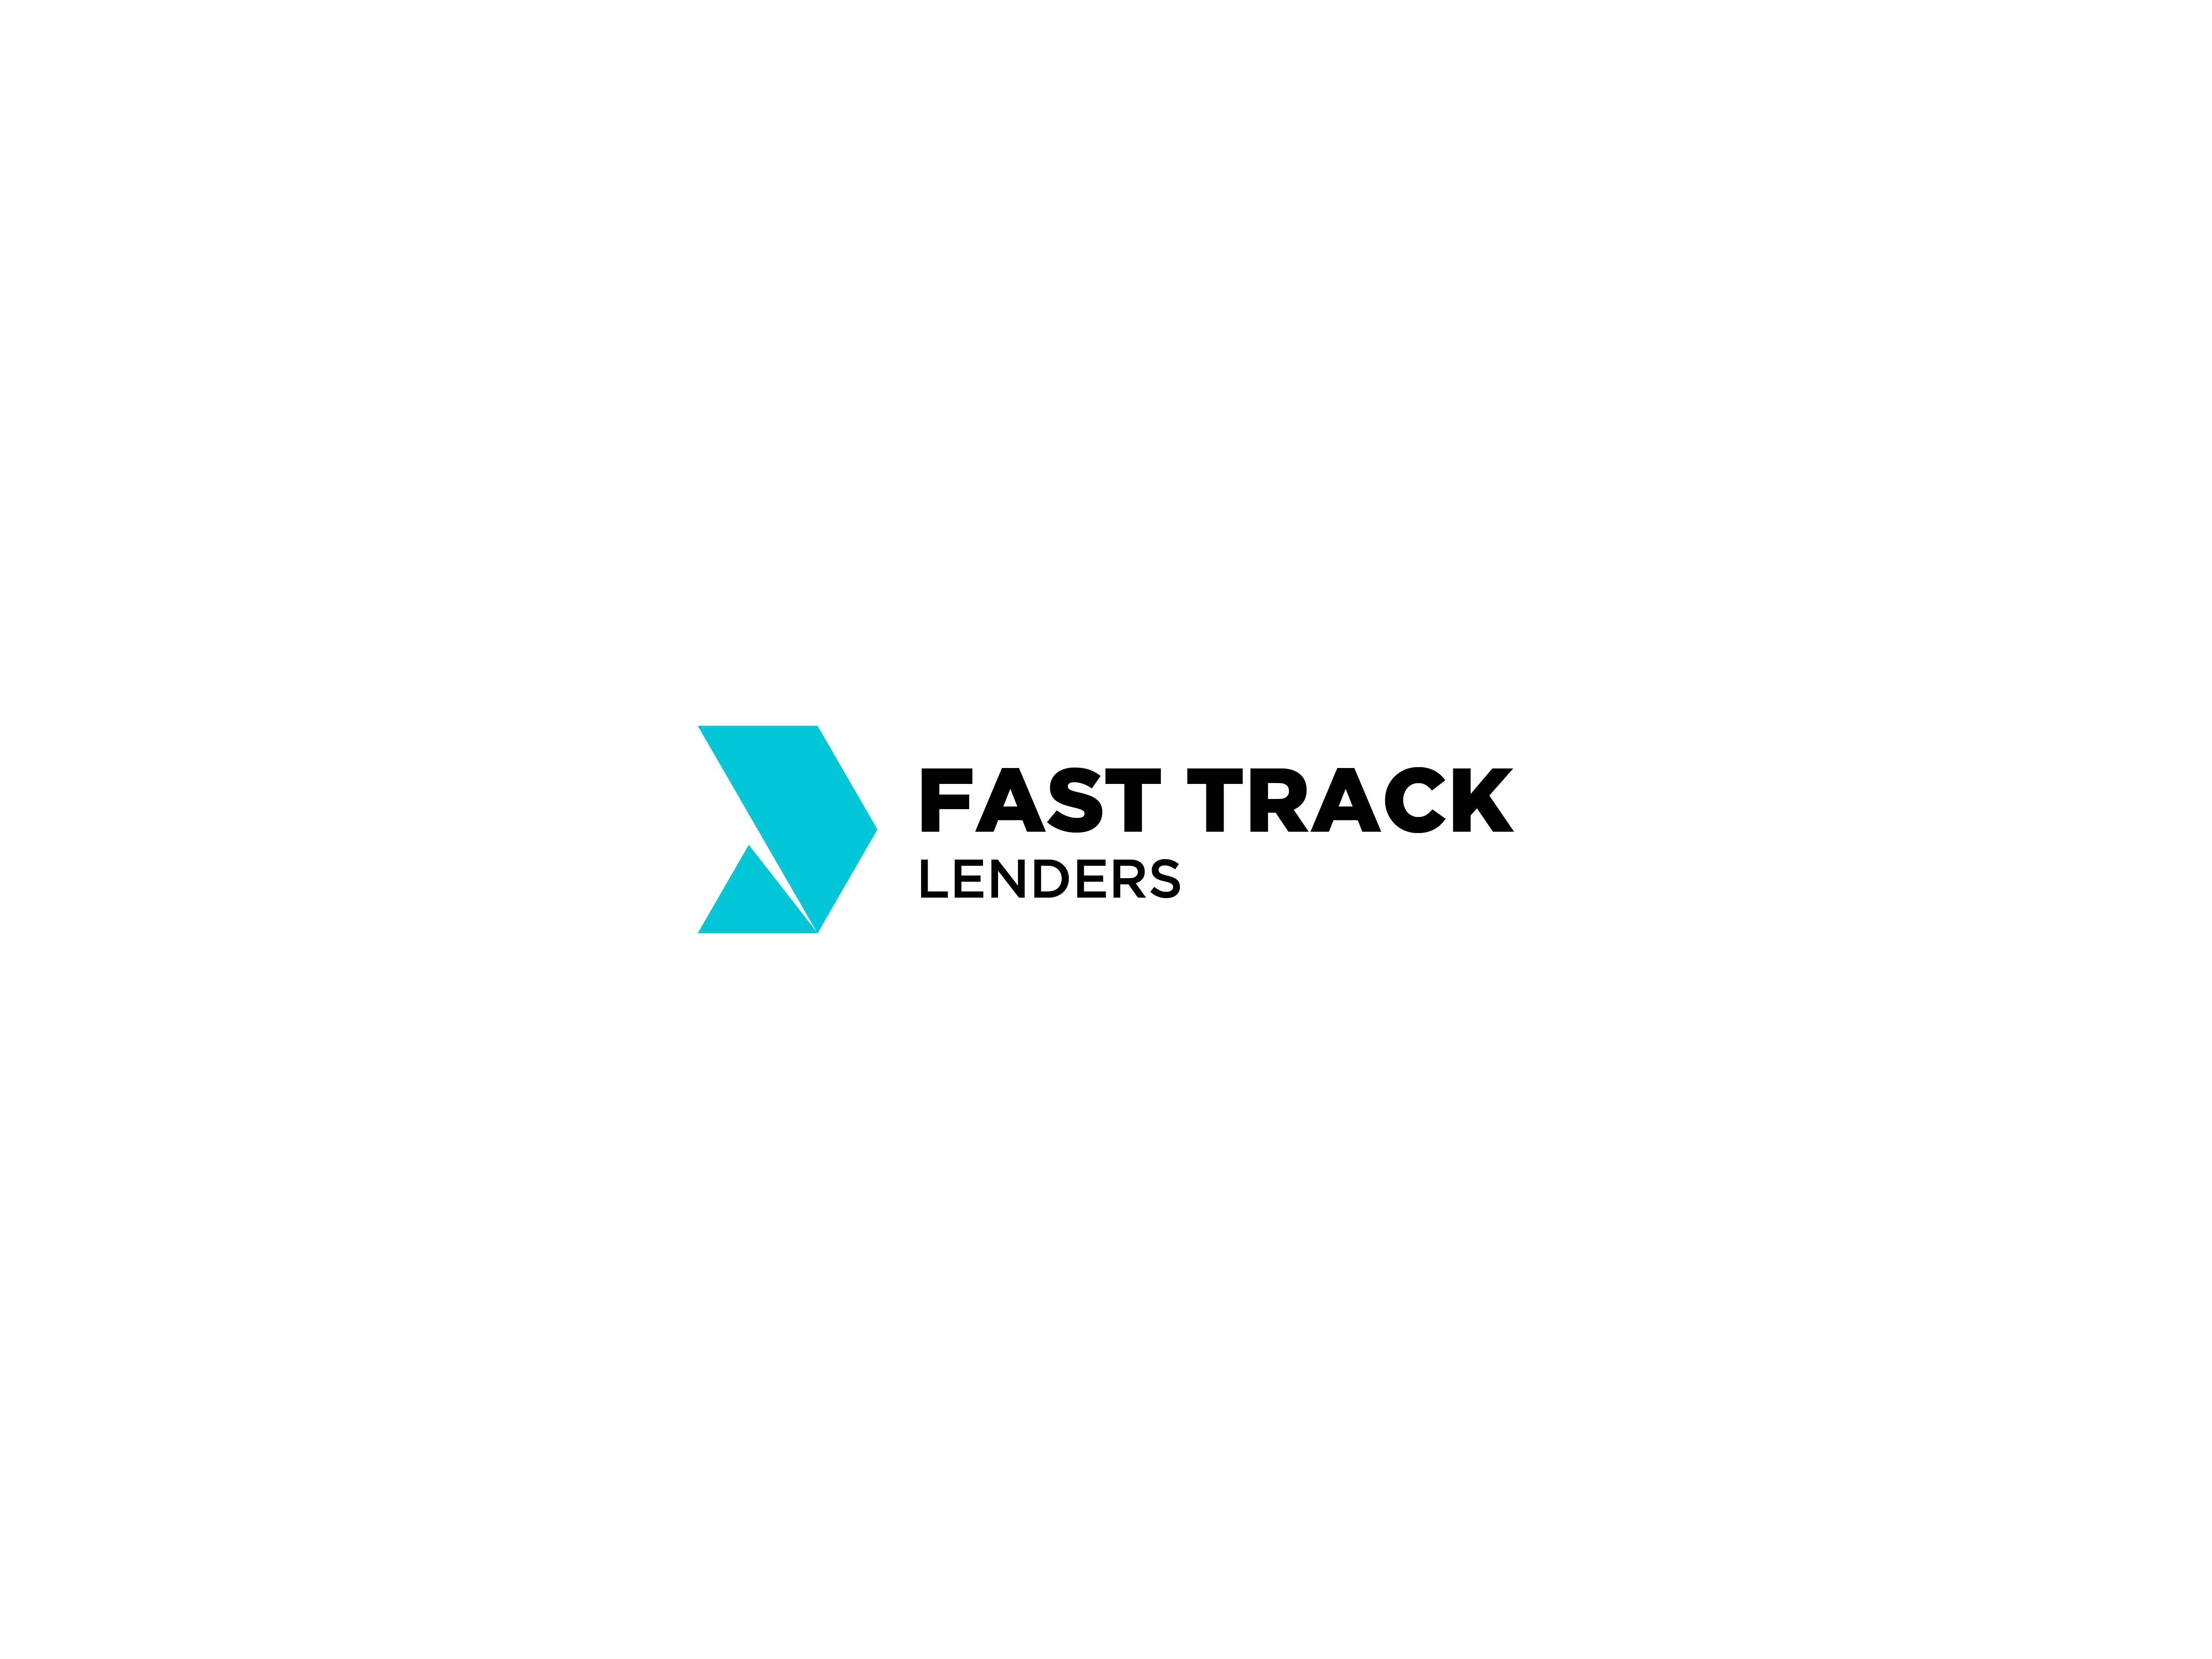 Fast Track Lenders